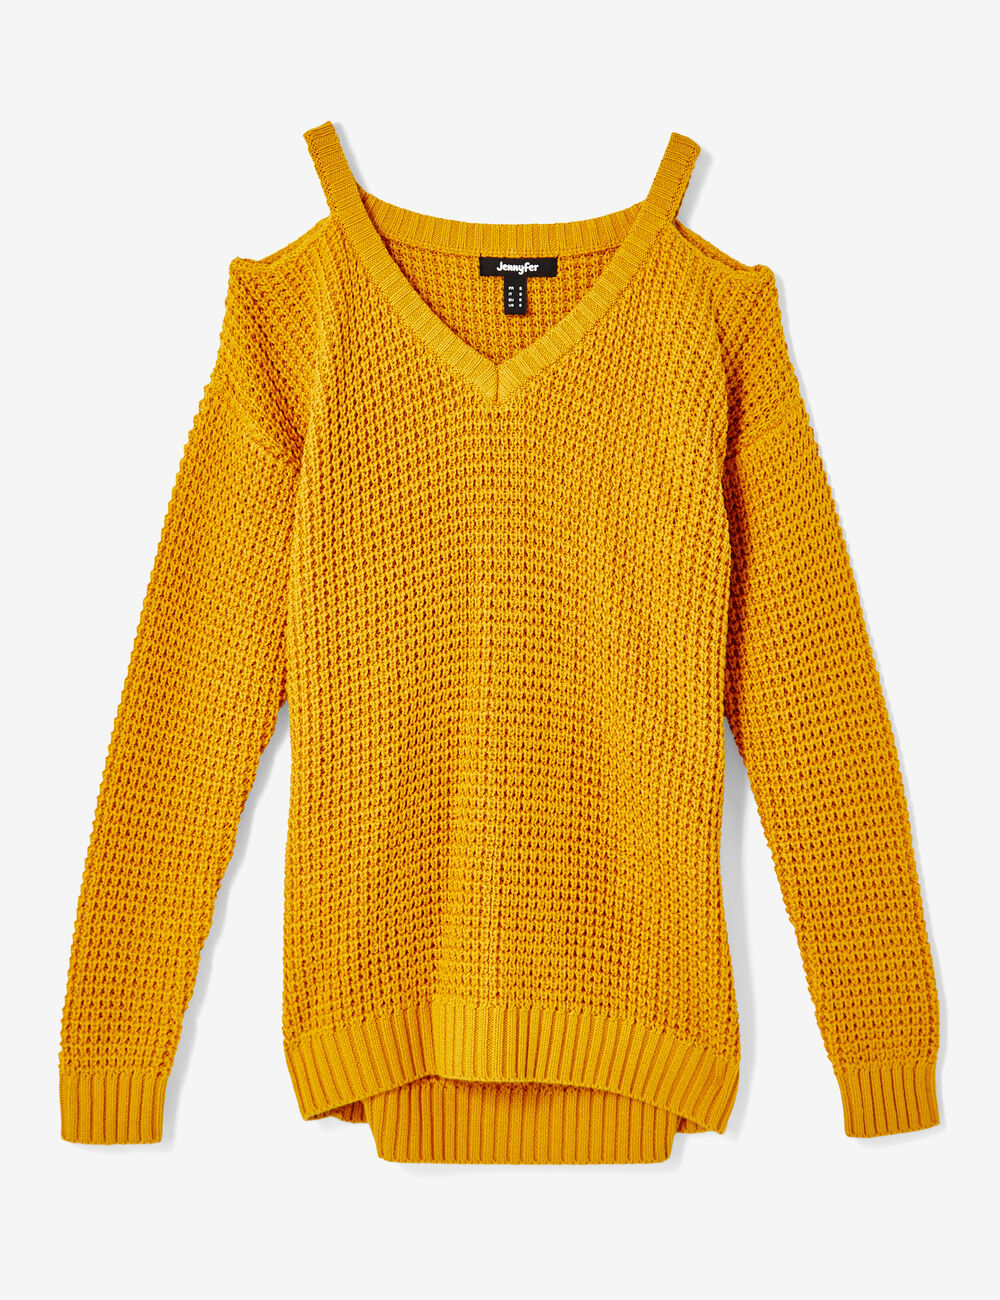 Robe jaune moutarde jennyfer